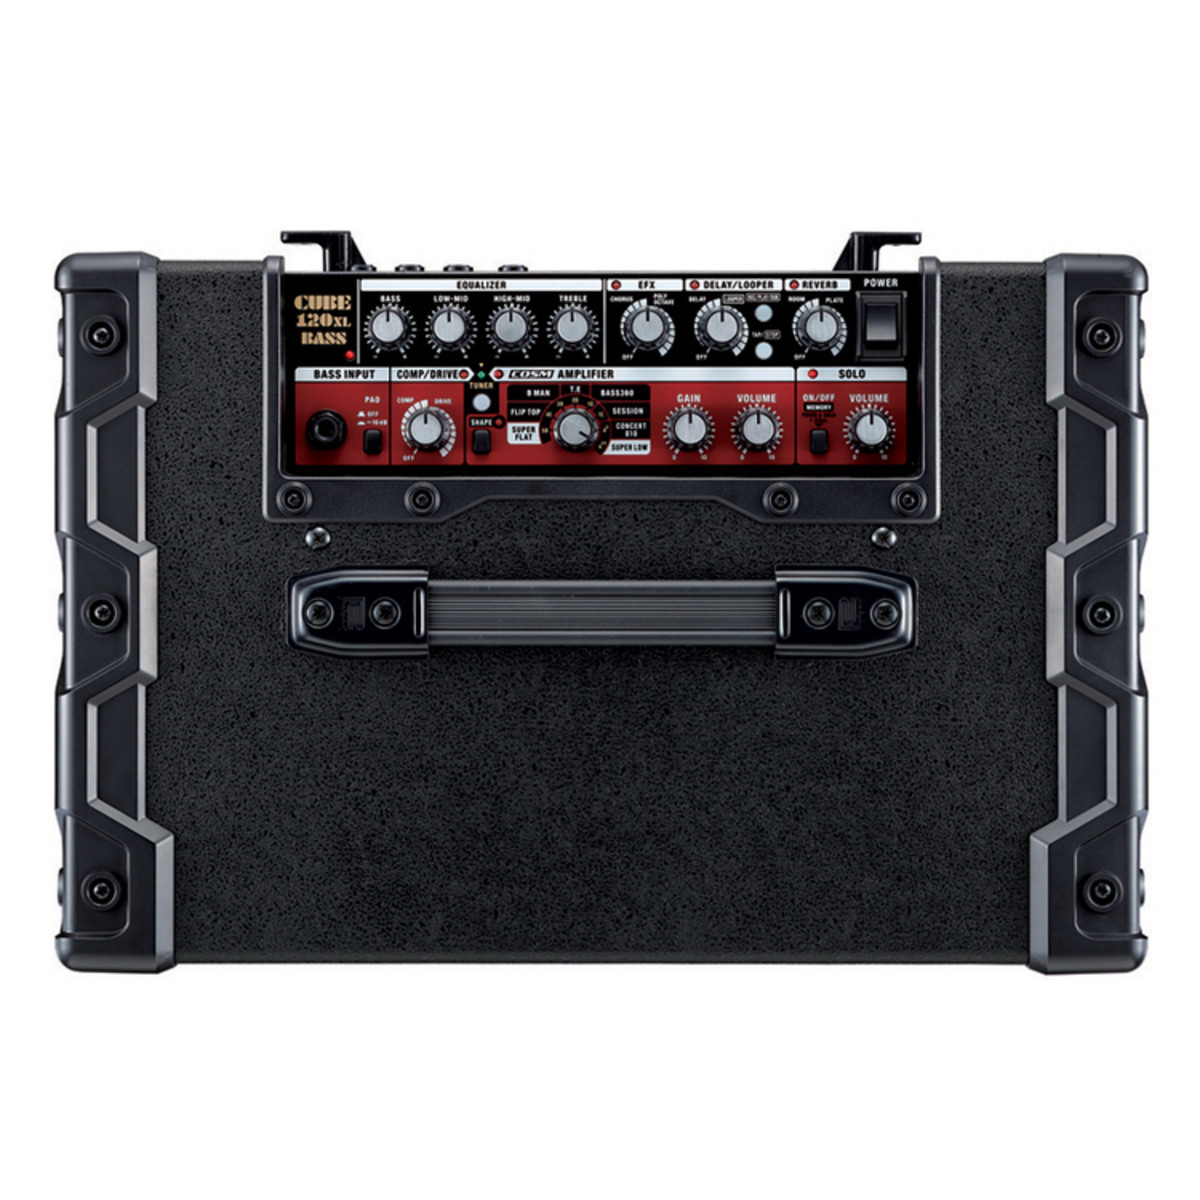 roland cube 120 xl bass amp at. Black Bedroom Furniture Sets. Home Design Ideas